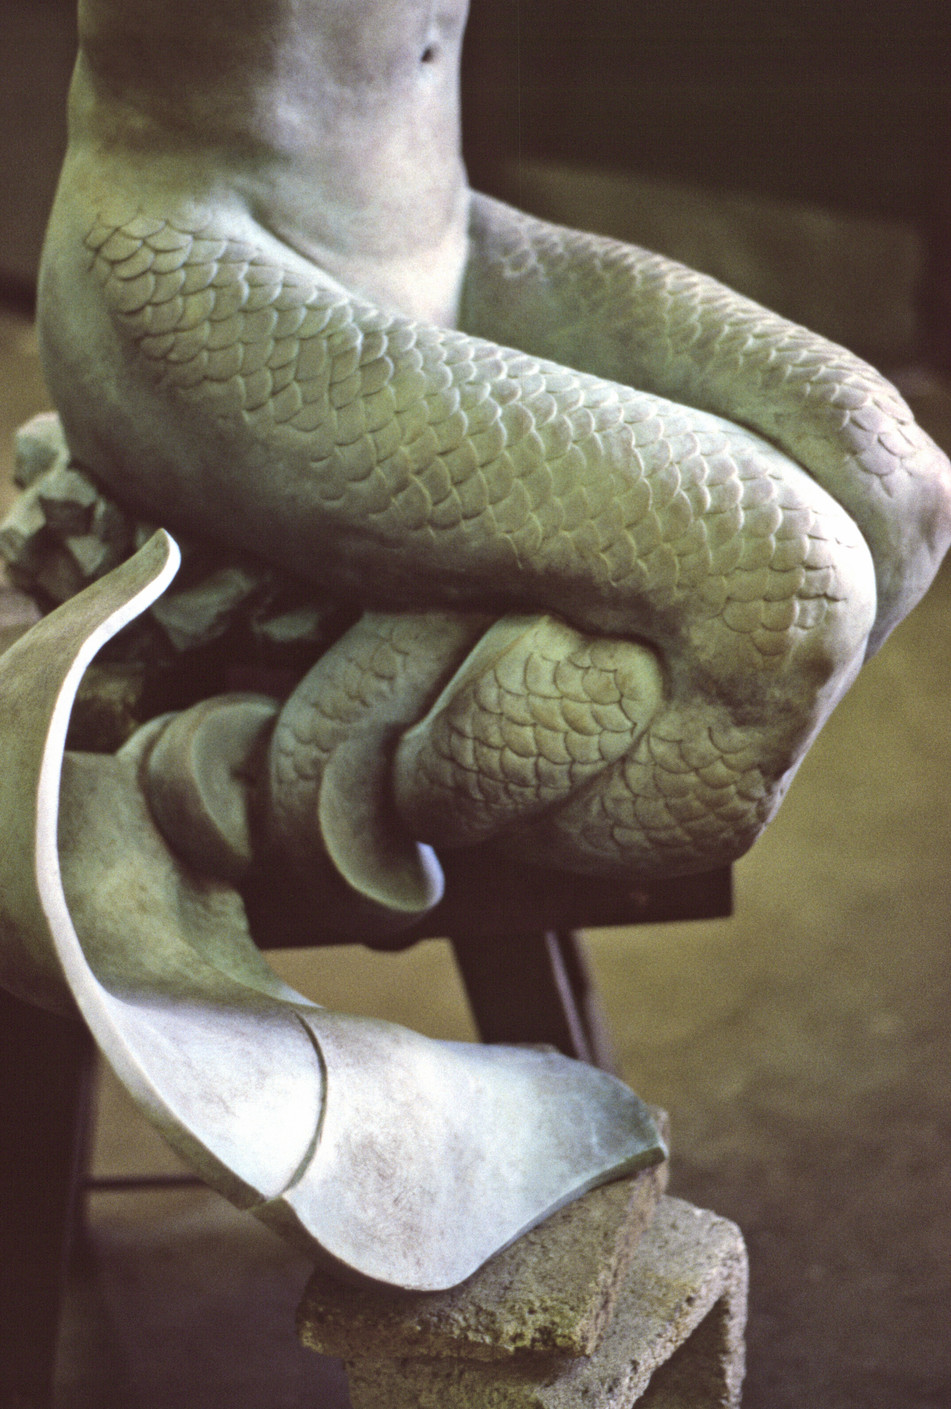 Merman (detail)